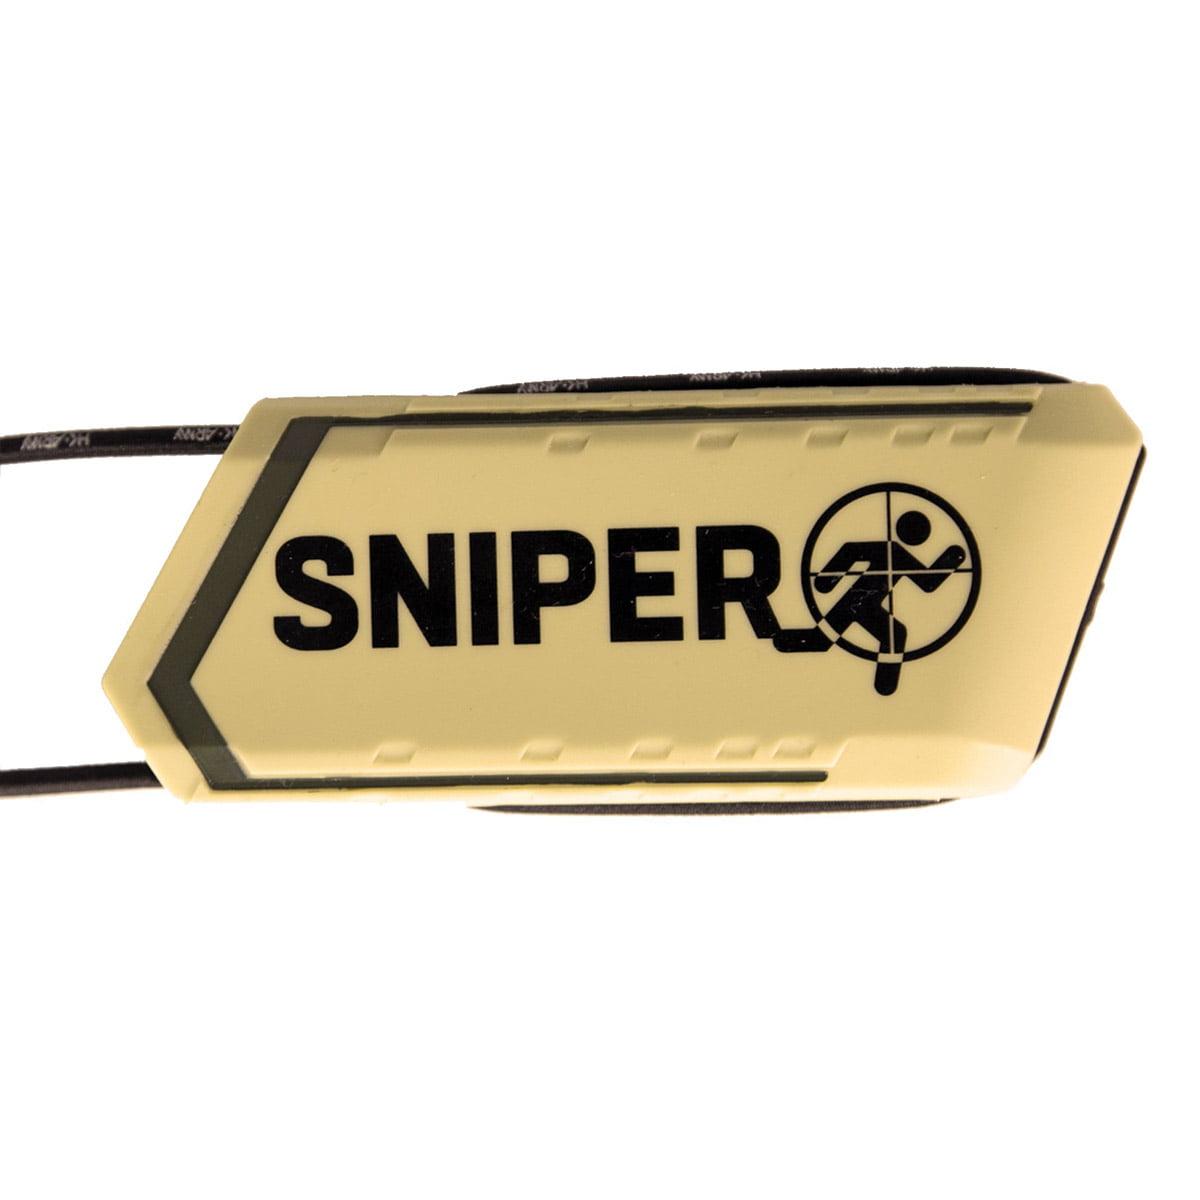 HK Army Barrel Condom / Cover - Ball Breaker 2.0 - Sniper